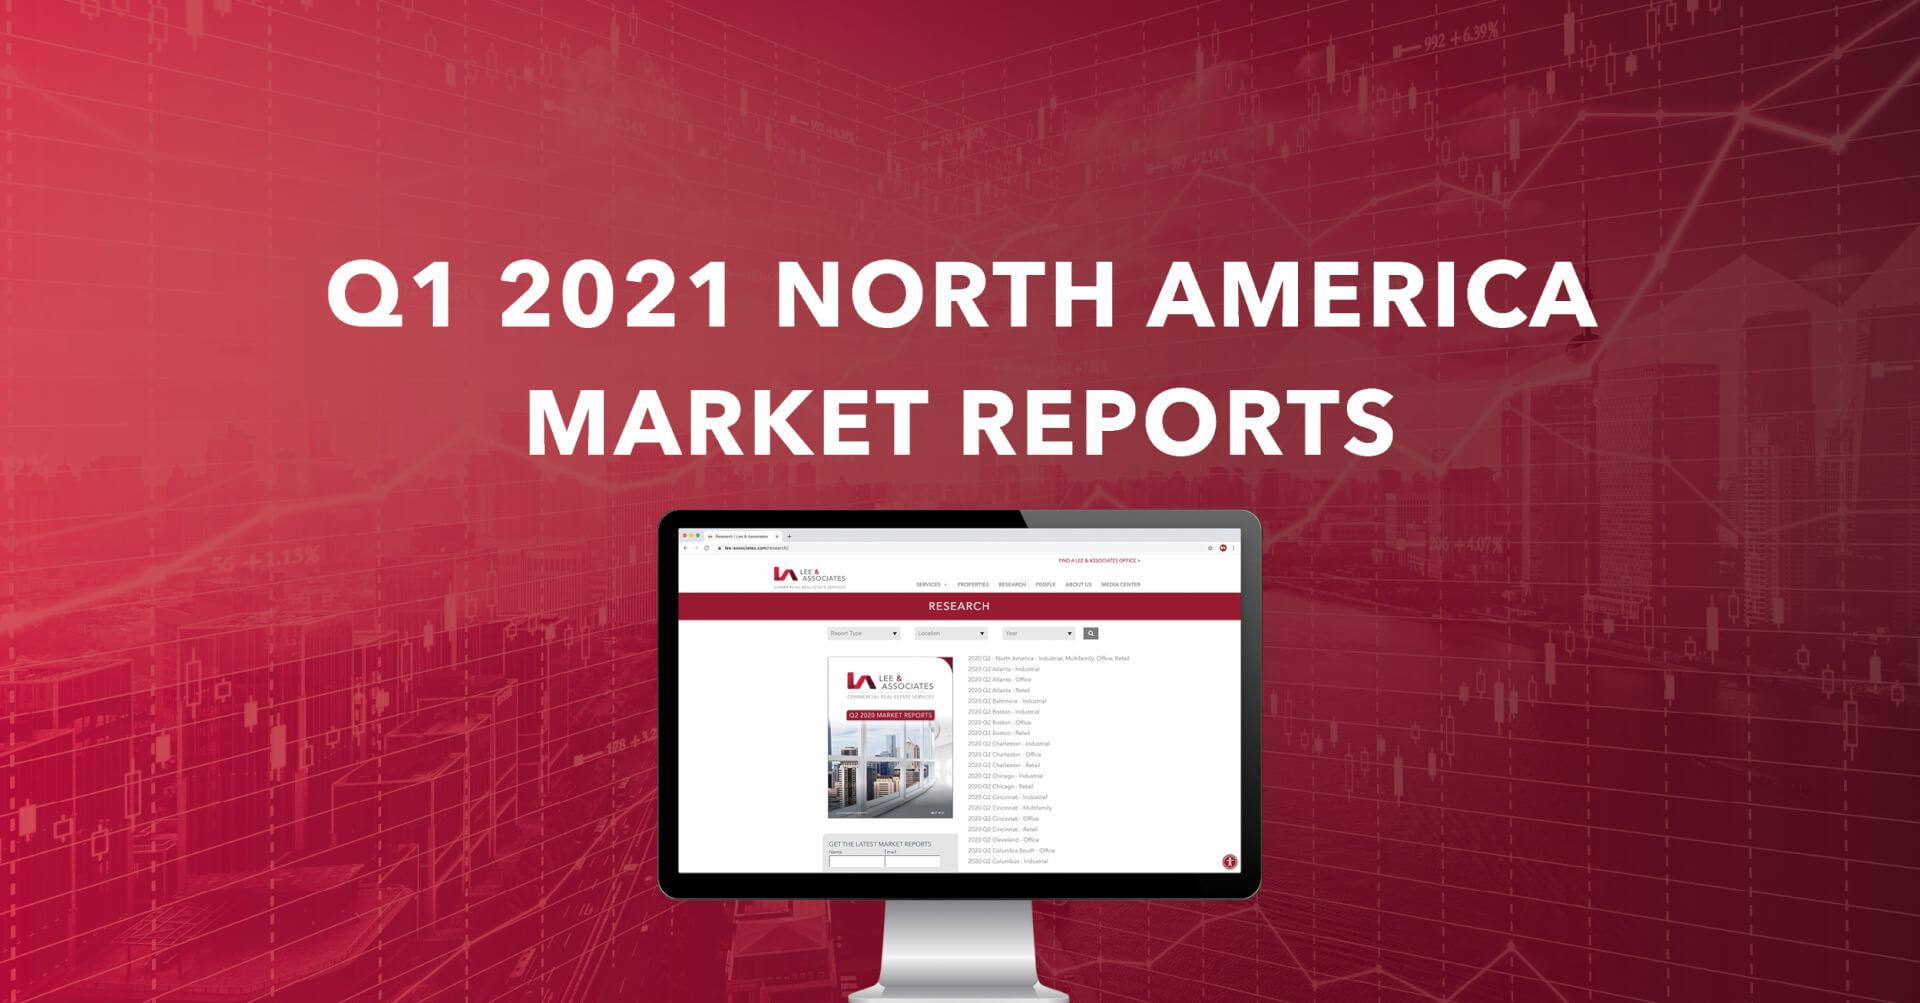 Q1 2021 North America Market Reports Released